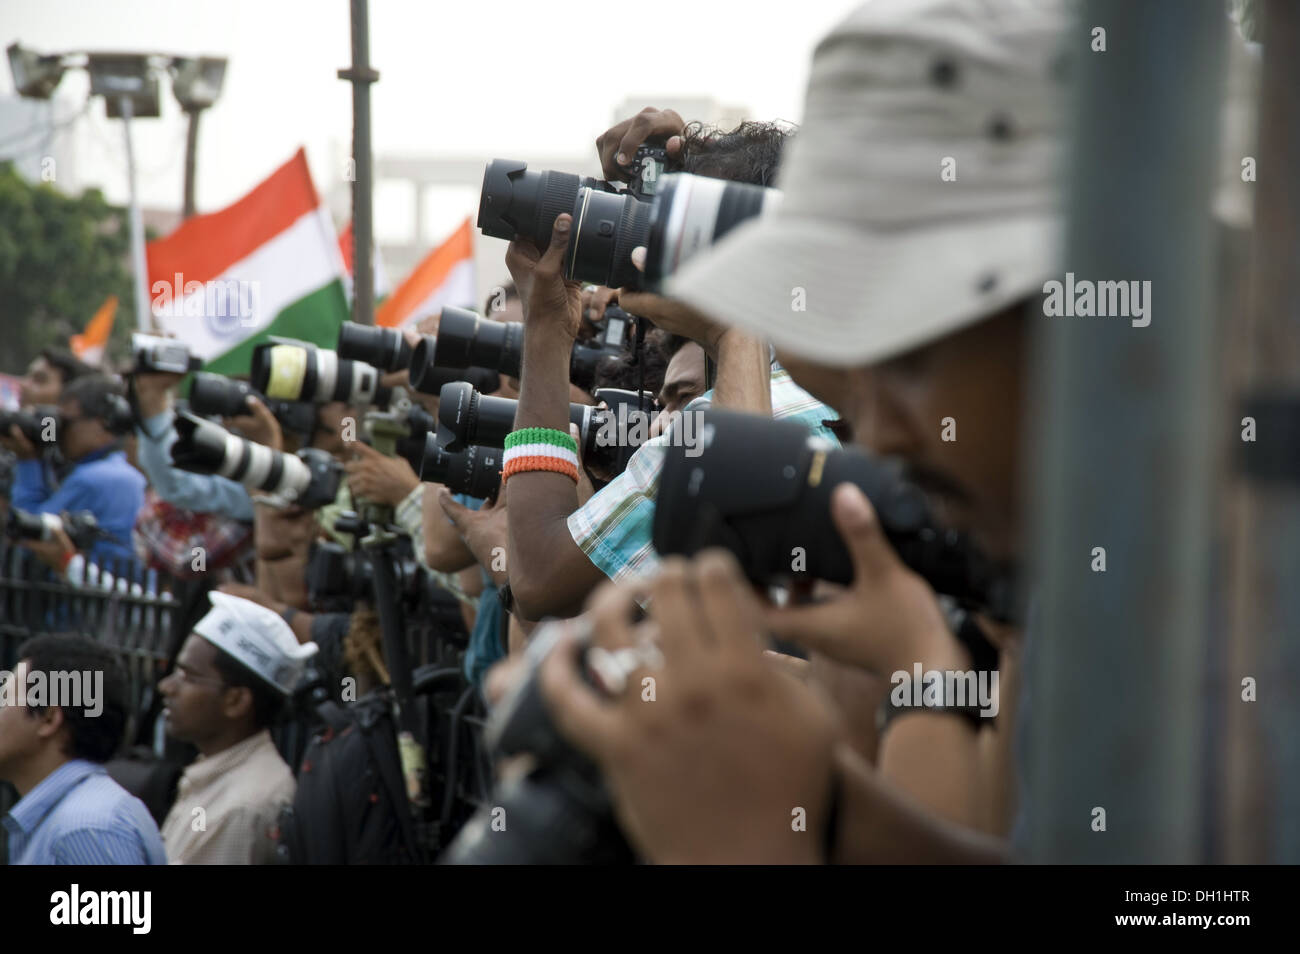 News press photographers in ramlila maidan new delhi India Asia - Stock Image